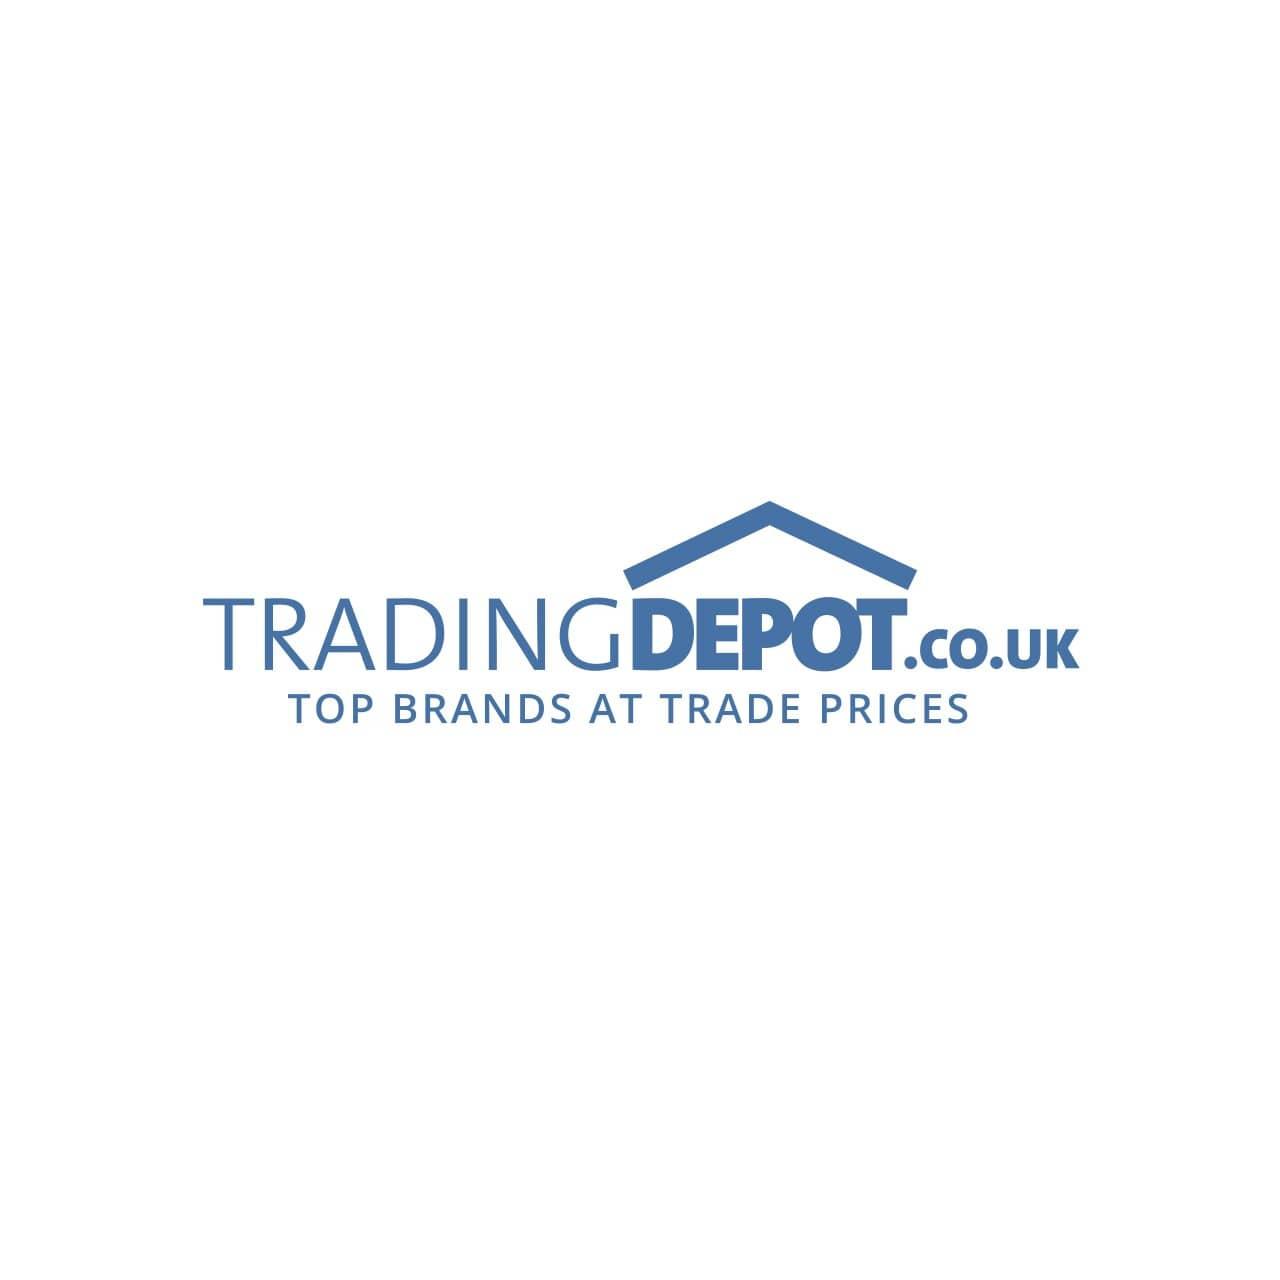 Velux Centre-Pivot Roof Window - Triple Glazed with Anti-Dew & Easy Clean Glazing – White Polyurethane 78 x 98cm - GGU MK04 0066